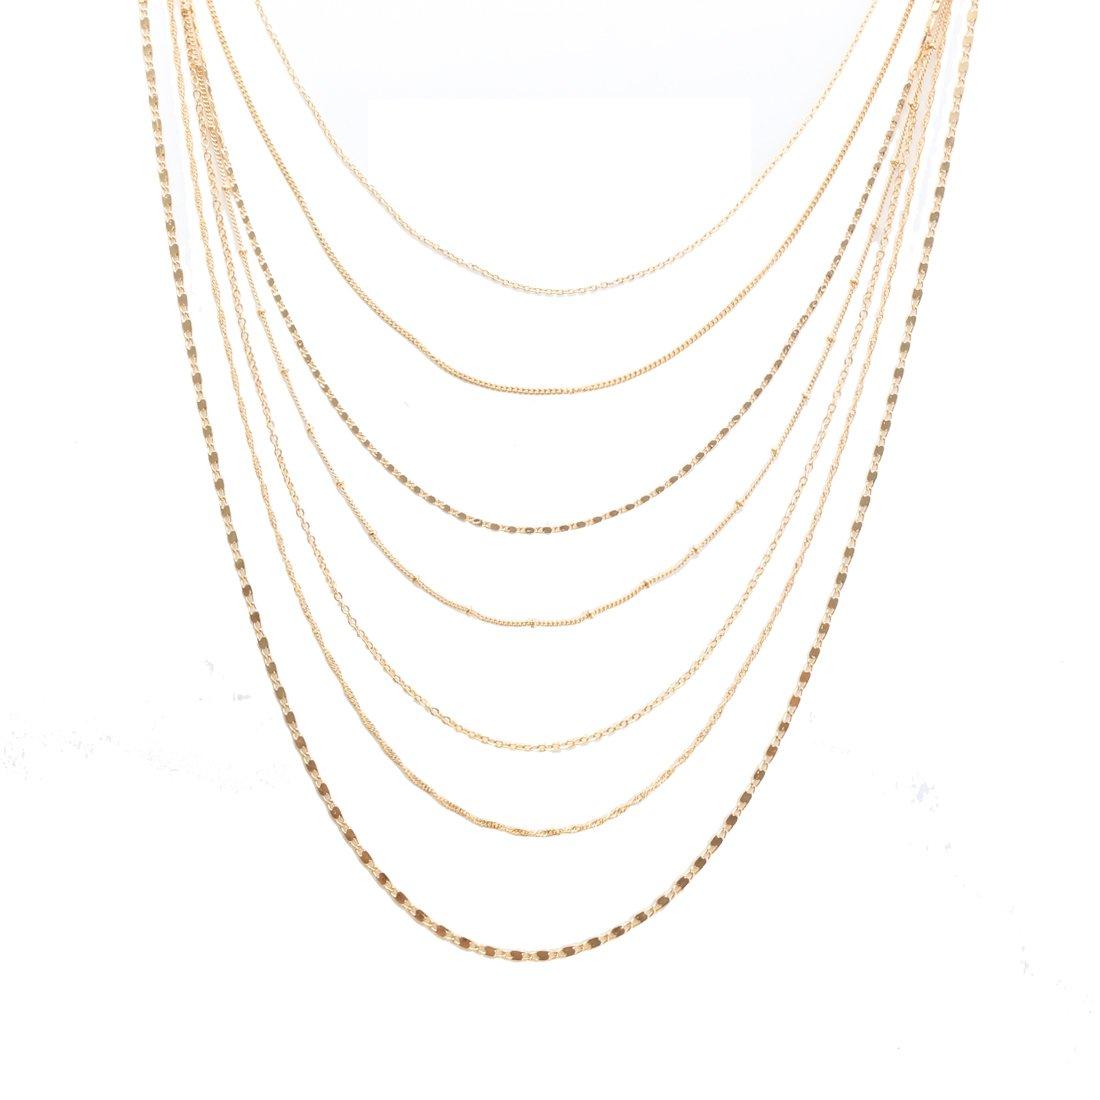 a3278d70b3a76 Amazon.com  ELEARD Women Multi Chain Layered Necklace Waterfall Multi  Strand Jewel Chain Tassel Necklace (Gold)  Jewelry